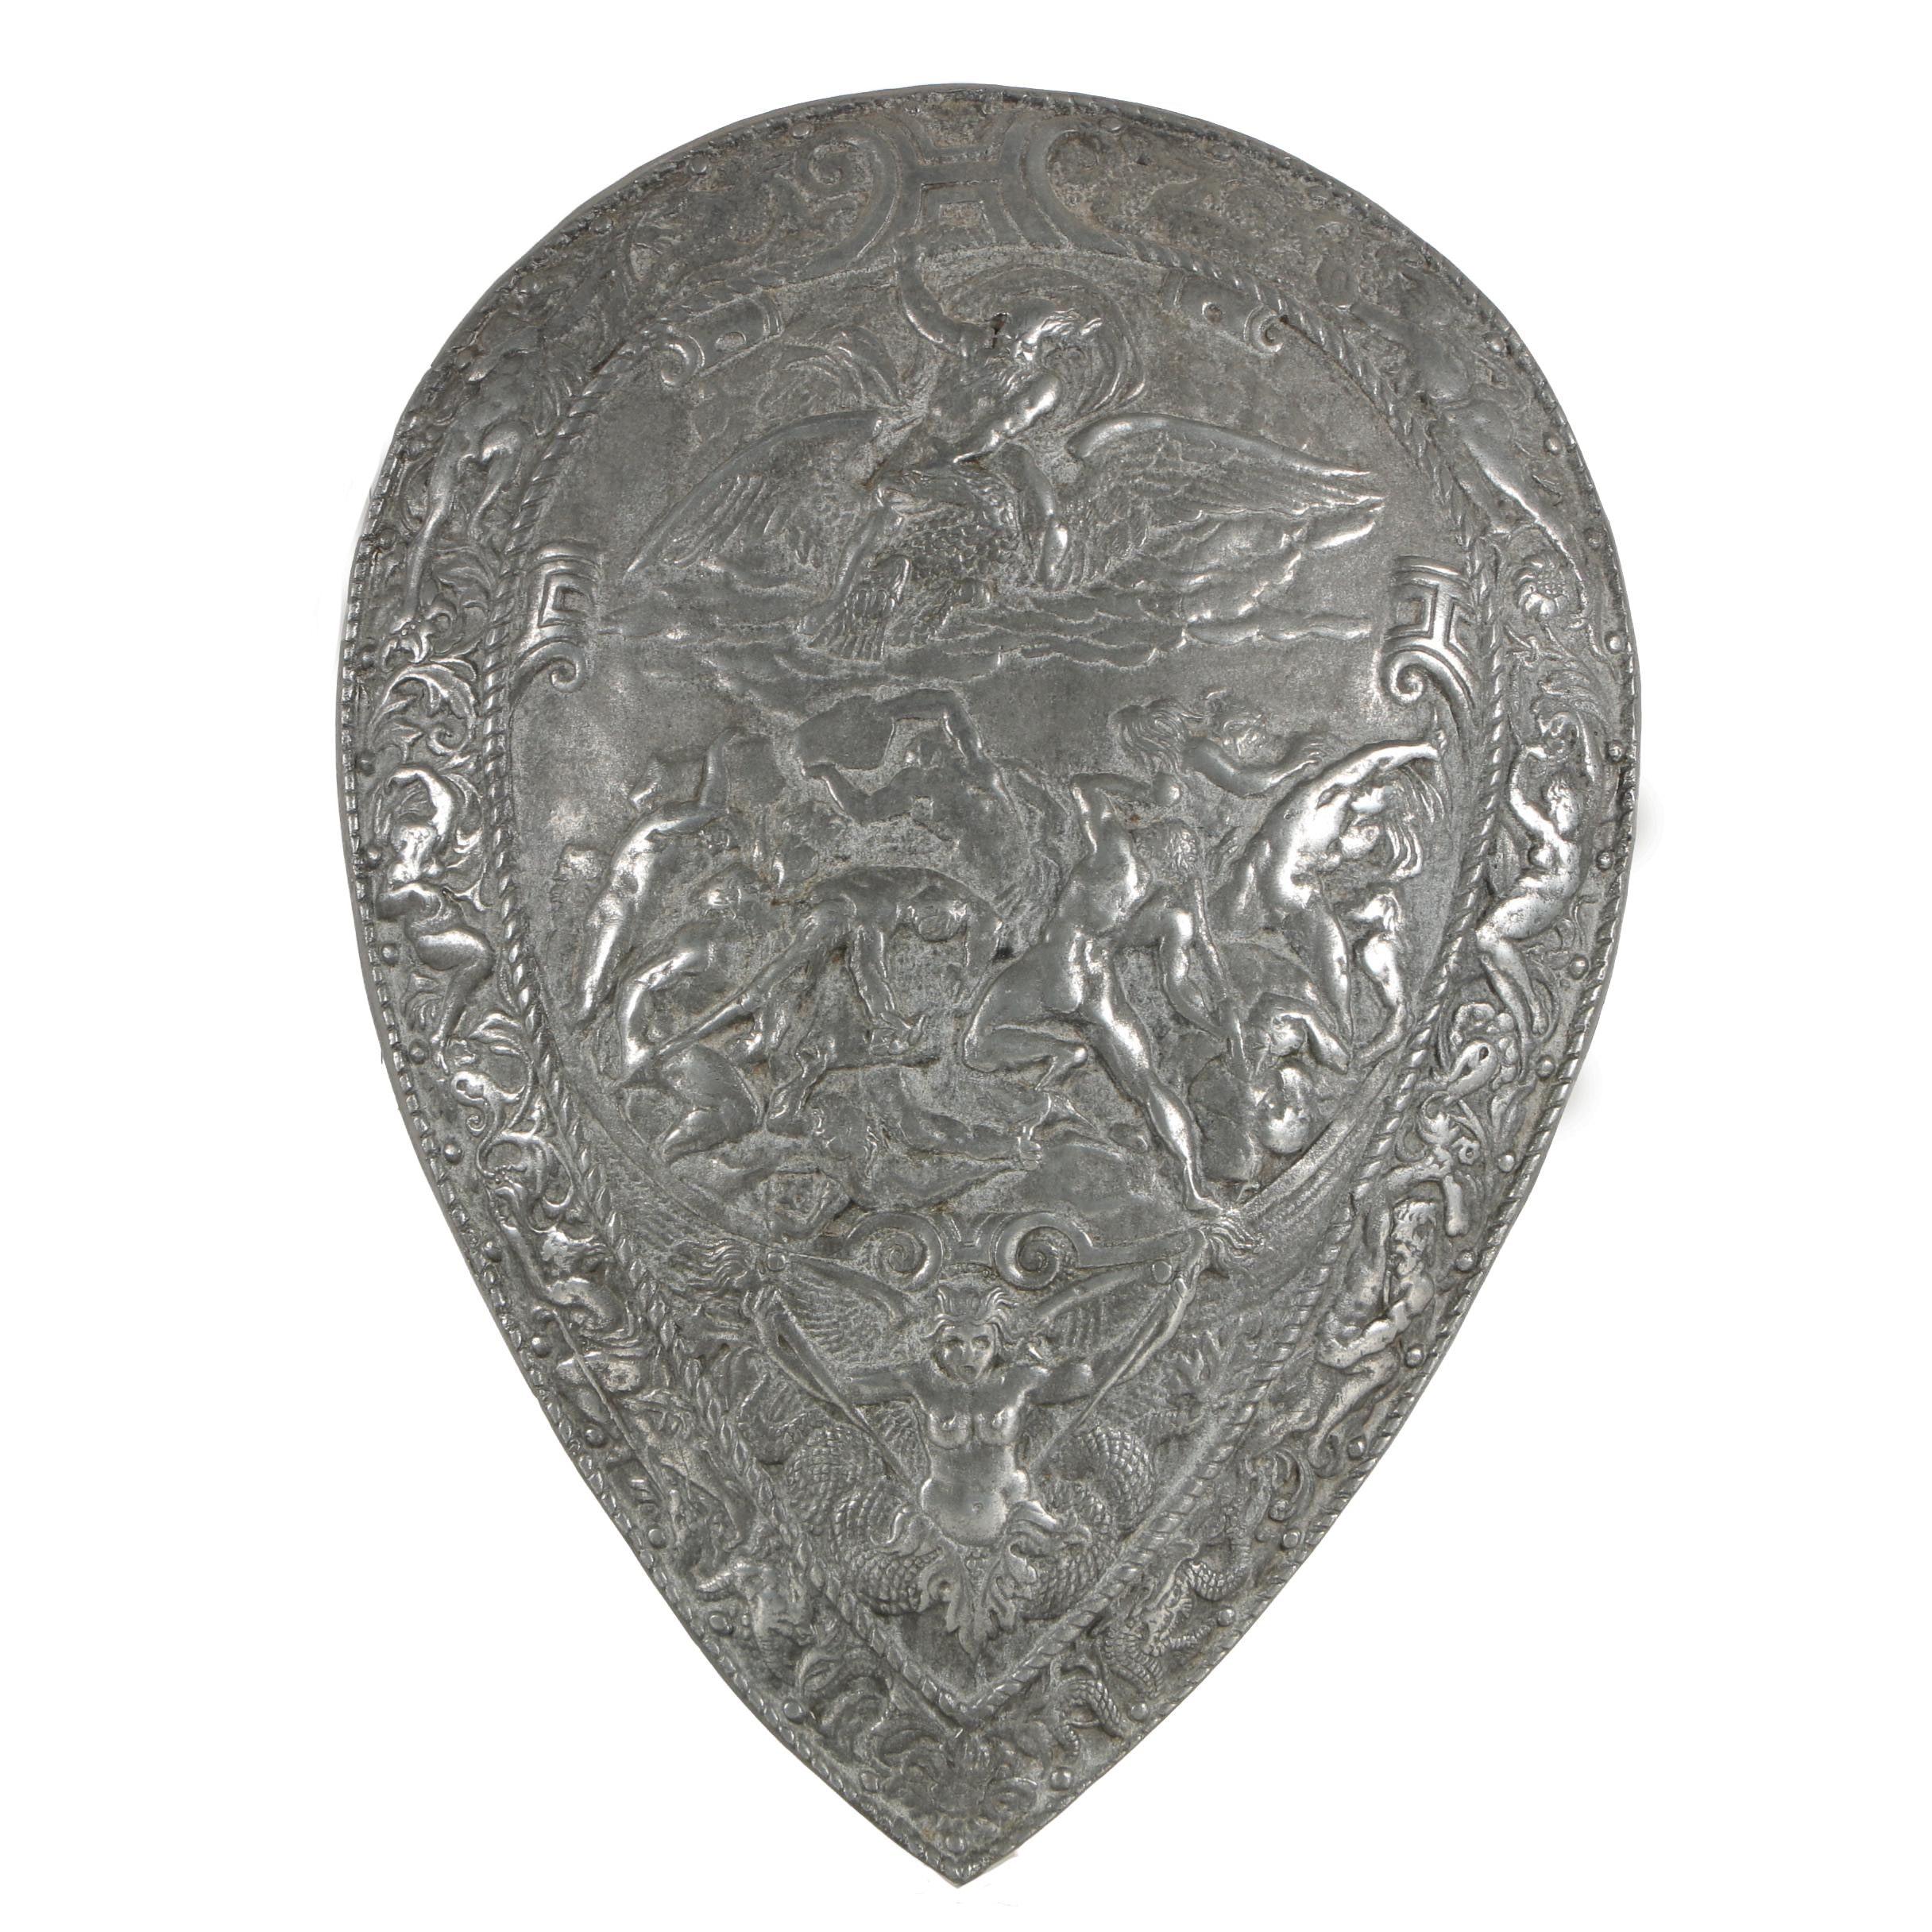 Modern Aluminum Reproduction Shield after Renaissance Era Germanic Shield